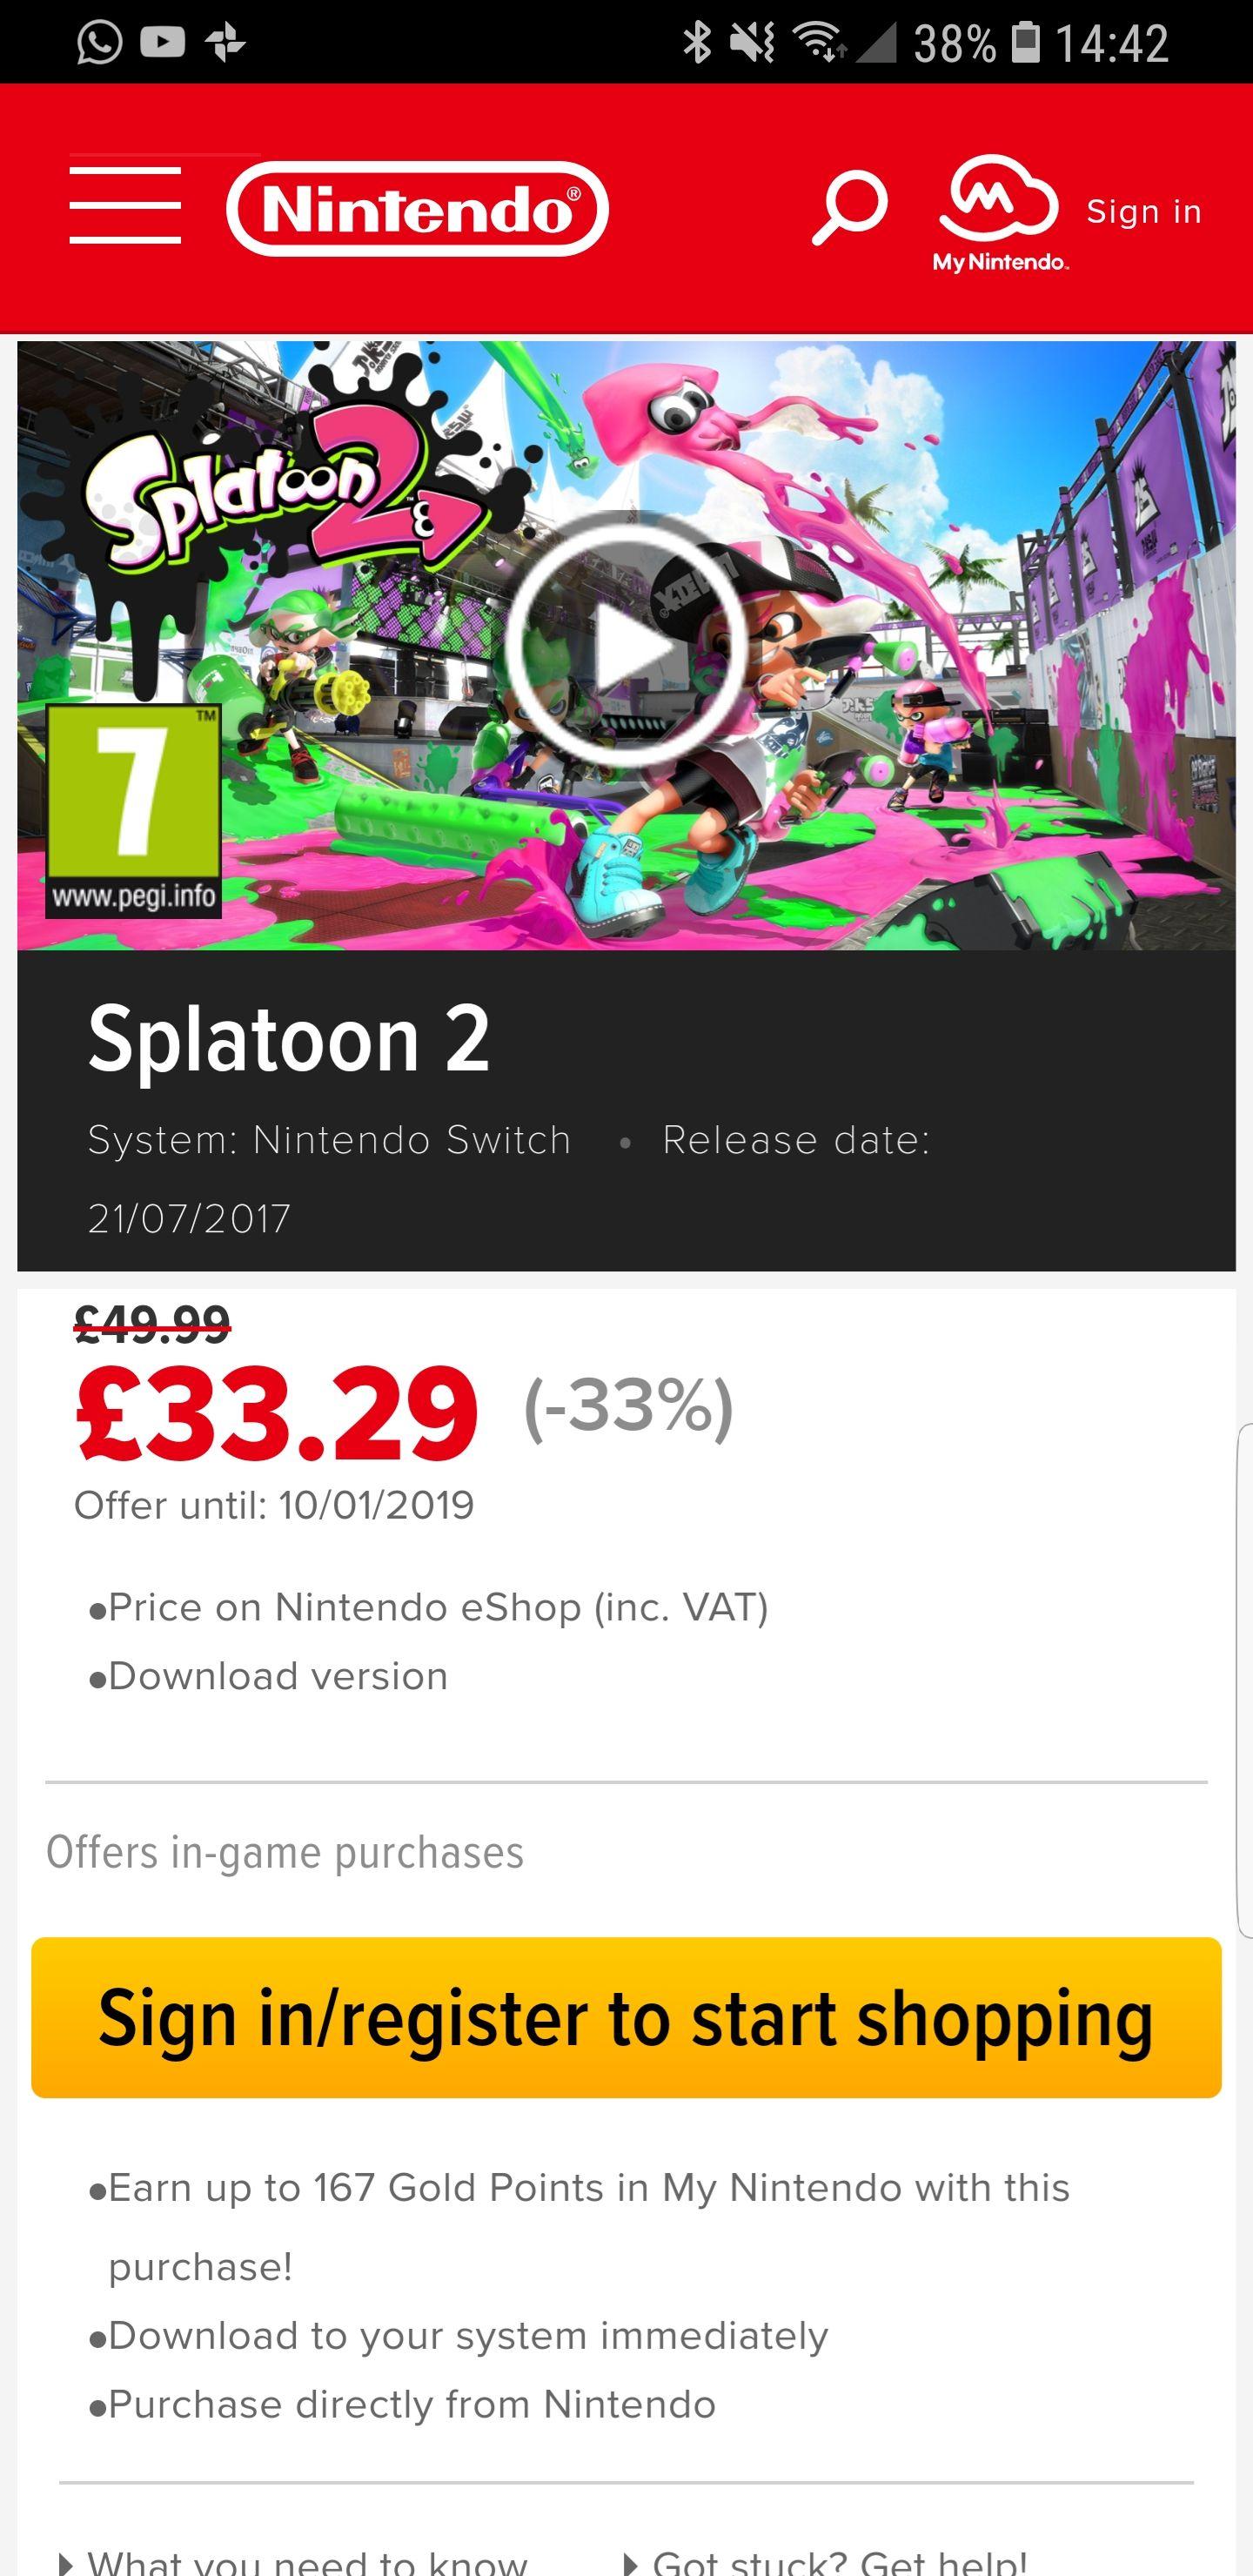 Splatoon 2 digital download for Nintendo Switch for £33.29 on Nintendo eShop